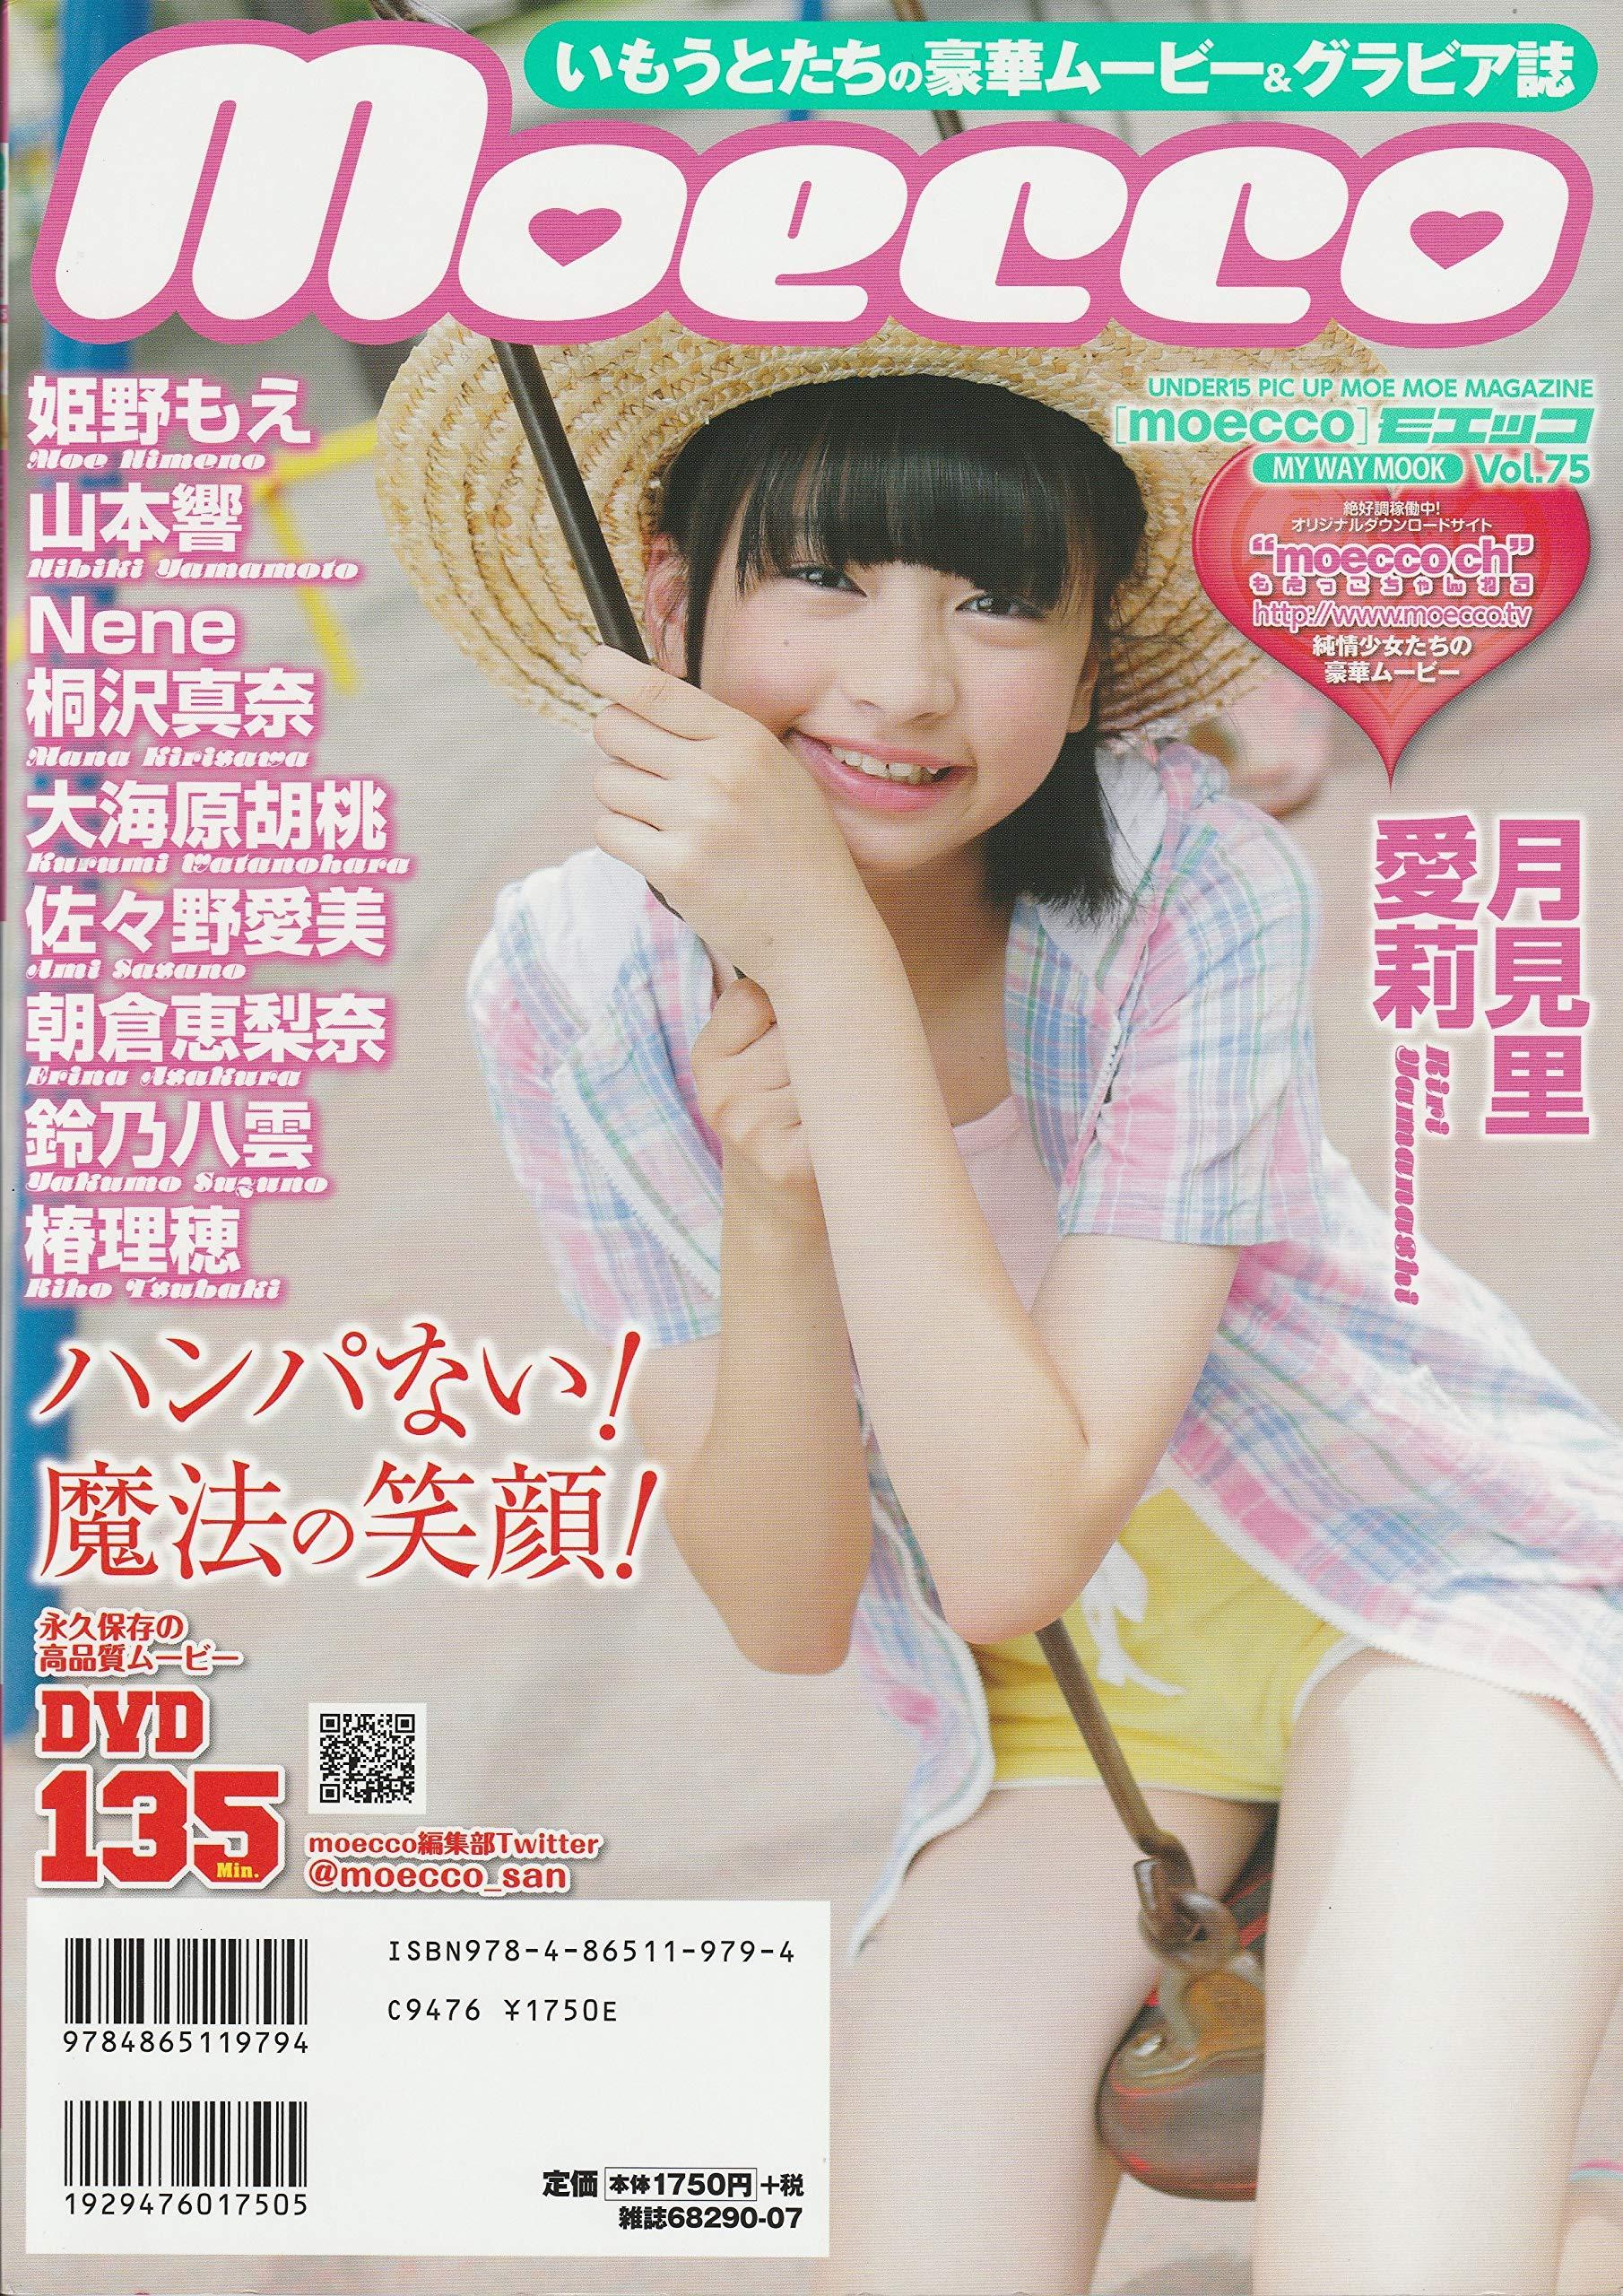 Junior Idol Moecco Ami Newhairstylesformen2014 Com - Foto